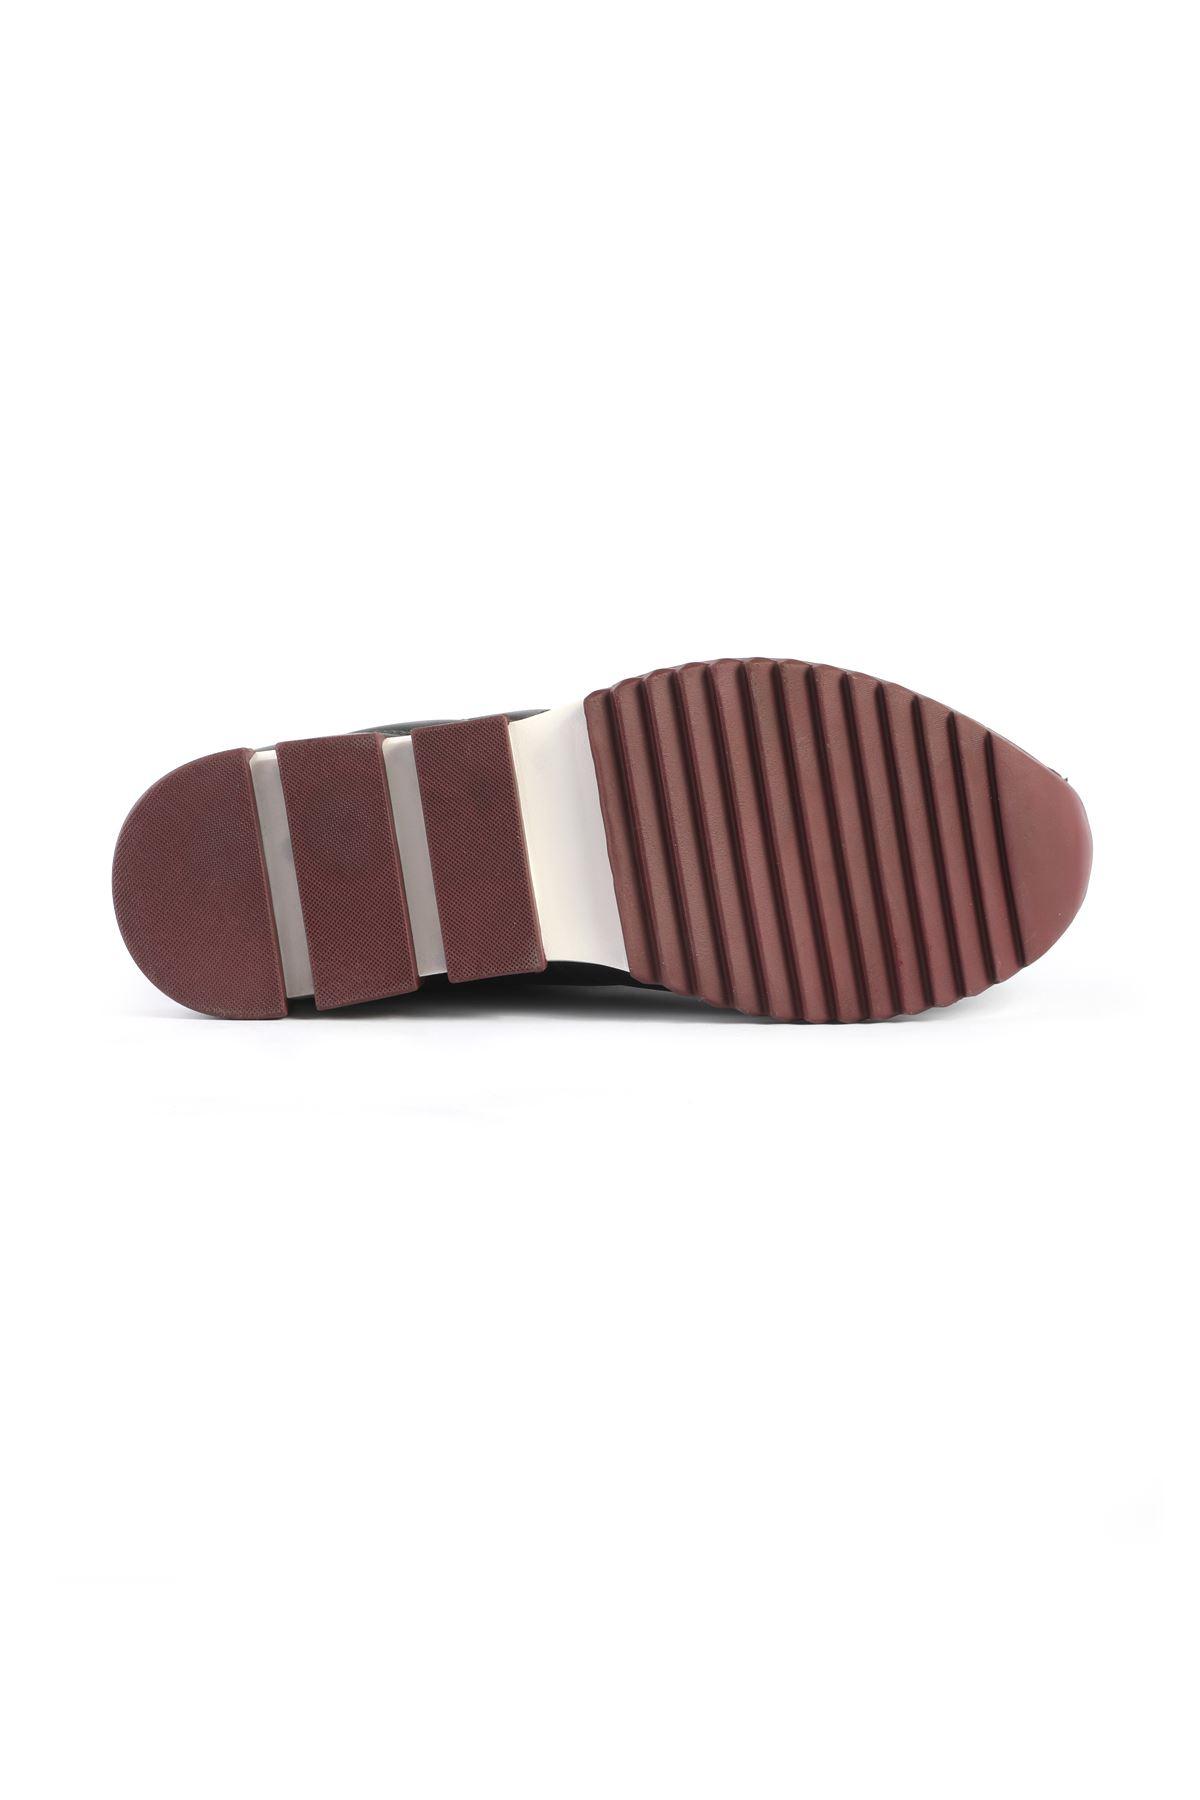 Libero 3392 S.Bordo Spor Ayakkabı